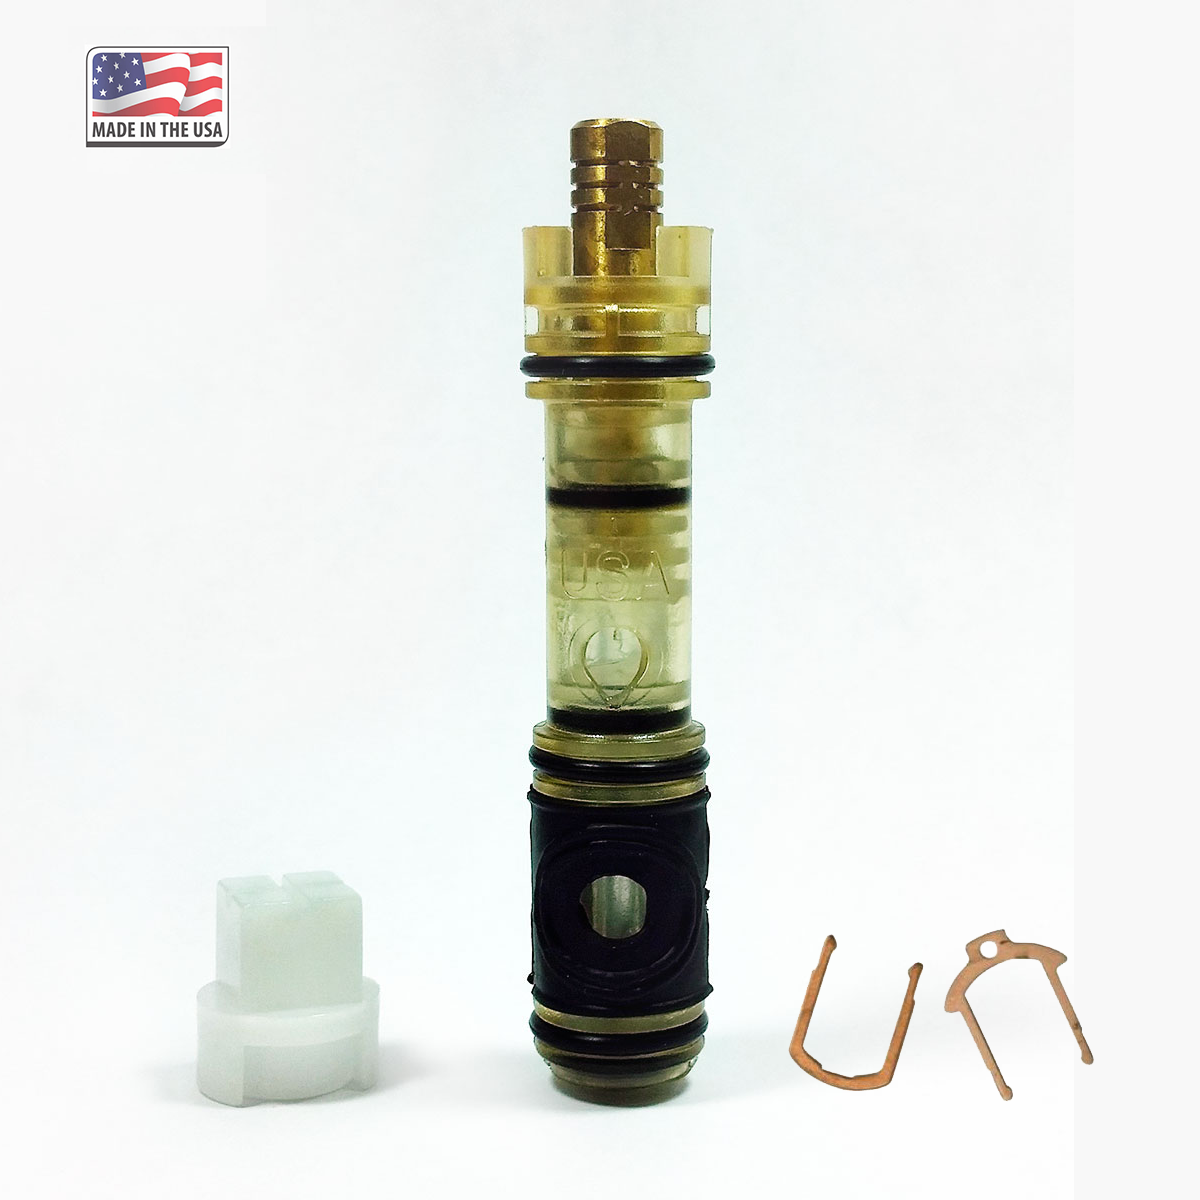 Flowrite Replacement Moen 1225 1225b Stem Cartridge Replacement